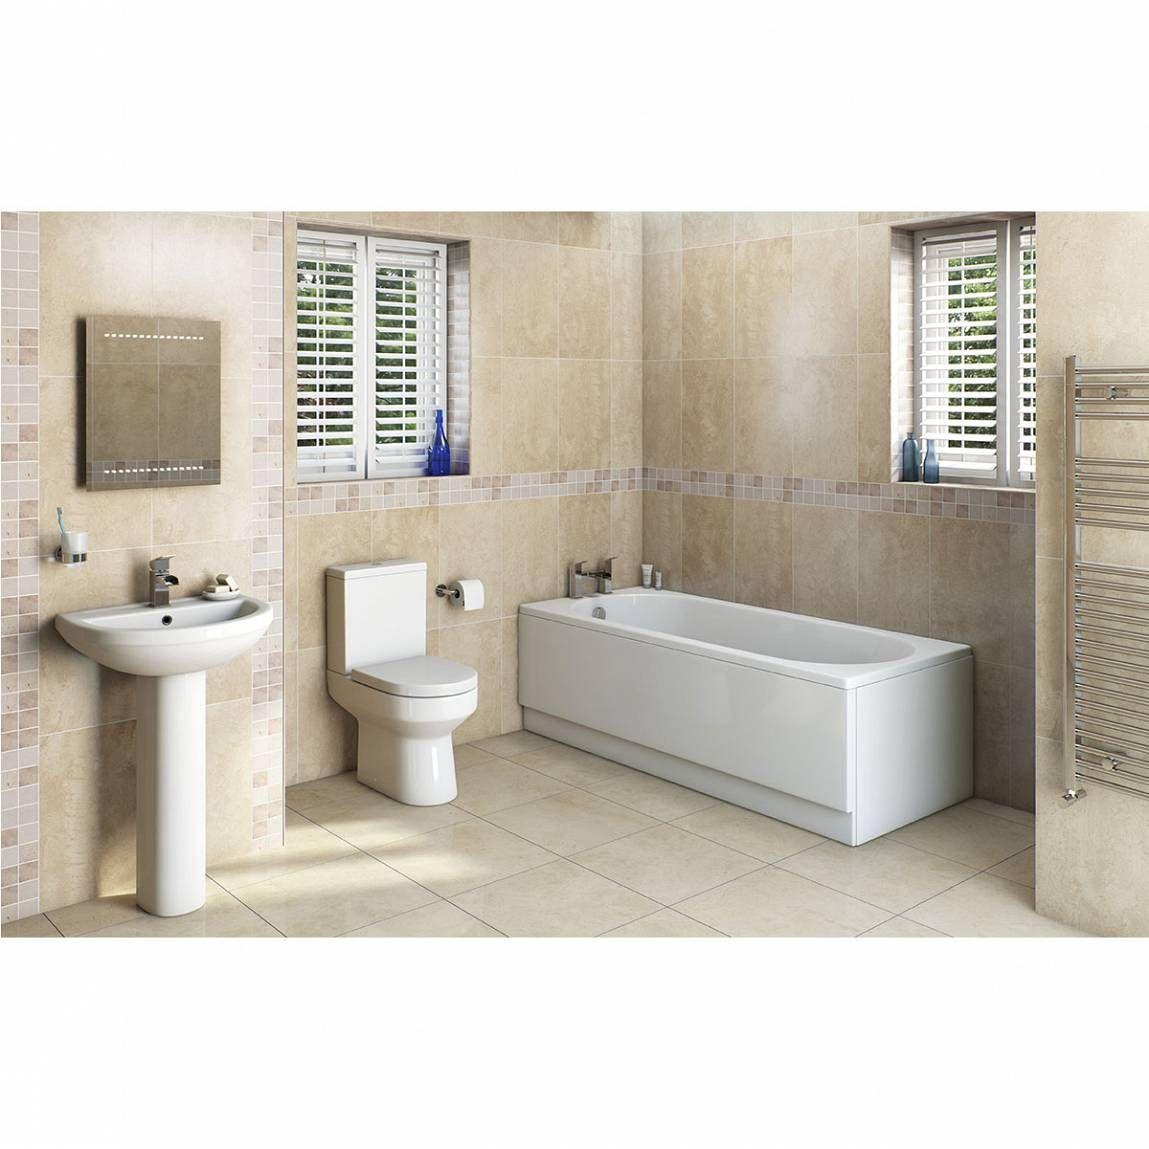 Oakley Bathroom Set With Richmond 1700 X 700 Bath Suite Victoria Plumb Straight Baths Bathroom Suite Bathroom Suites